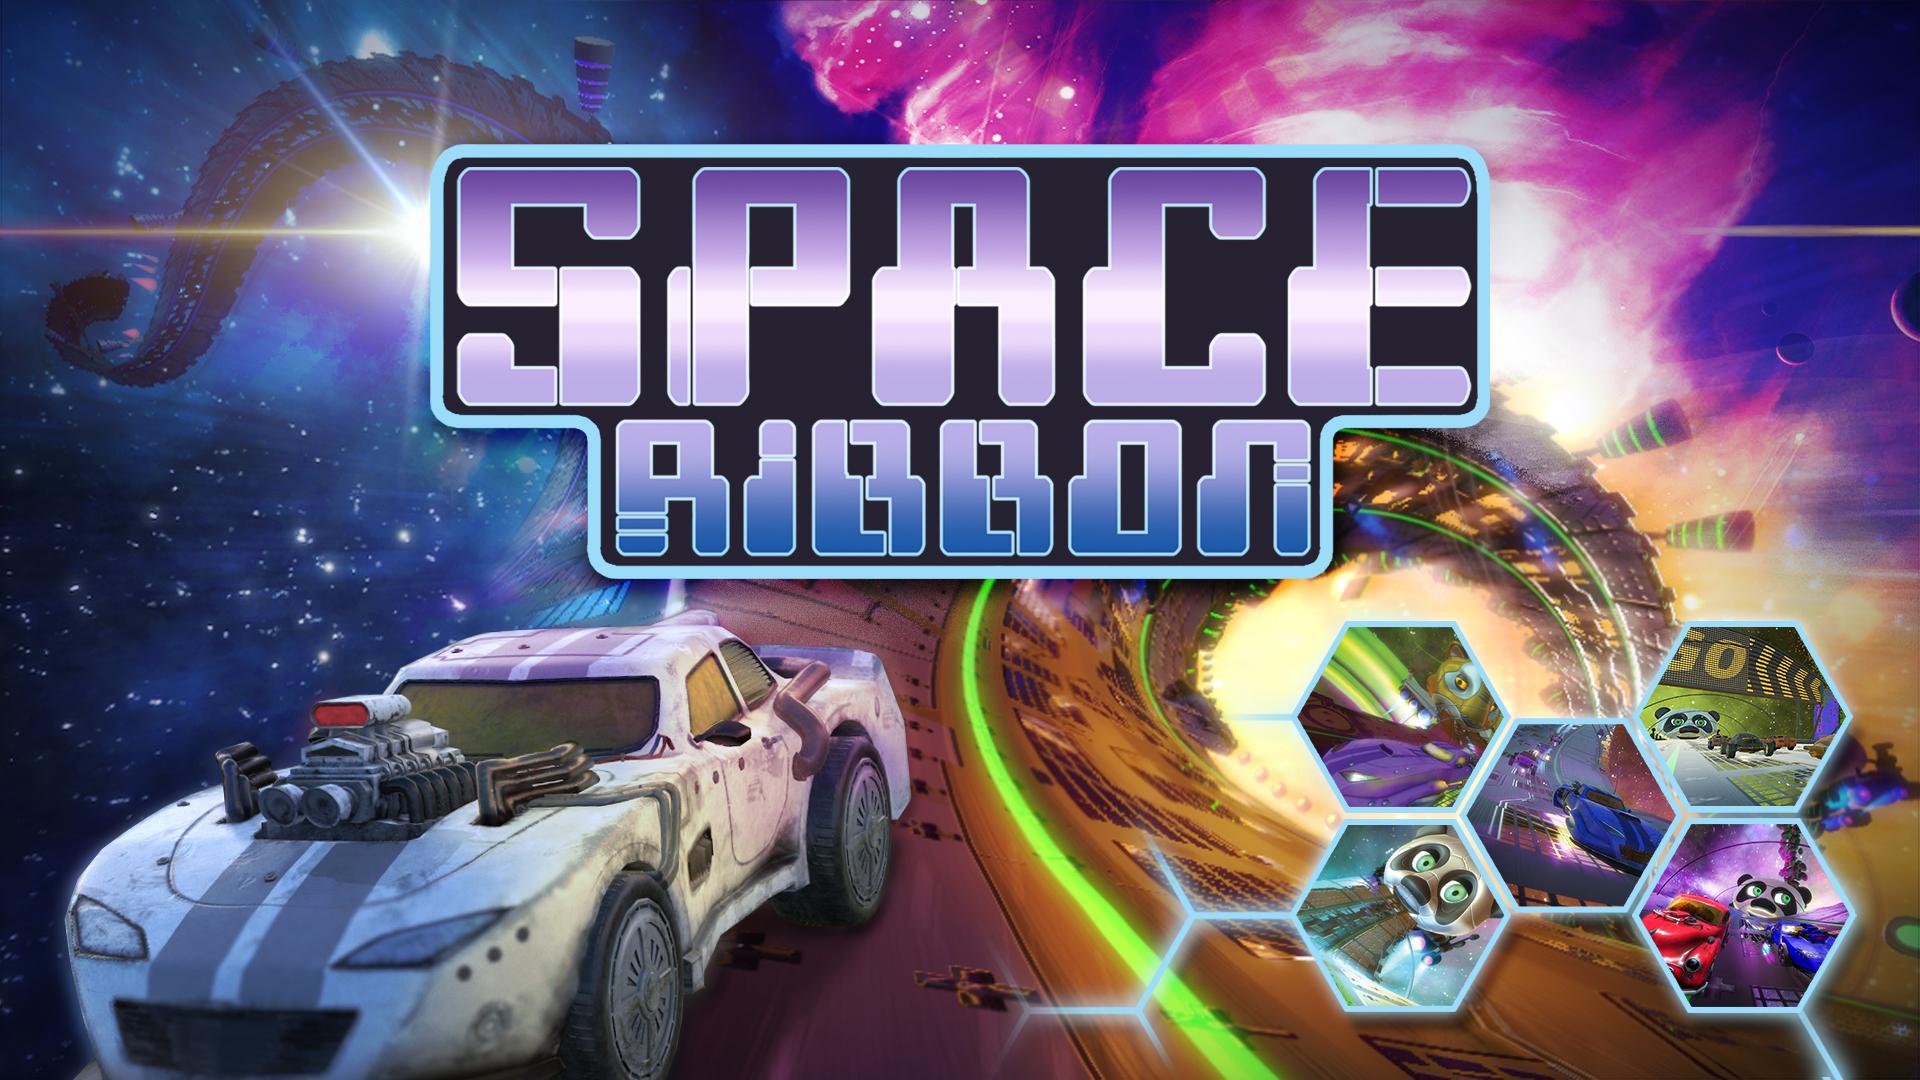 Nintendo Switch Space Ribbon - 48p @ eShop US